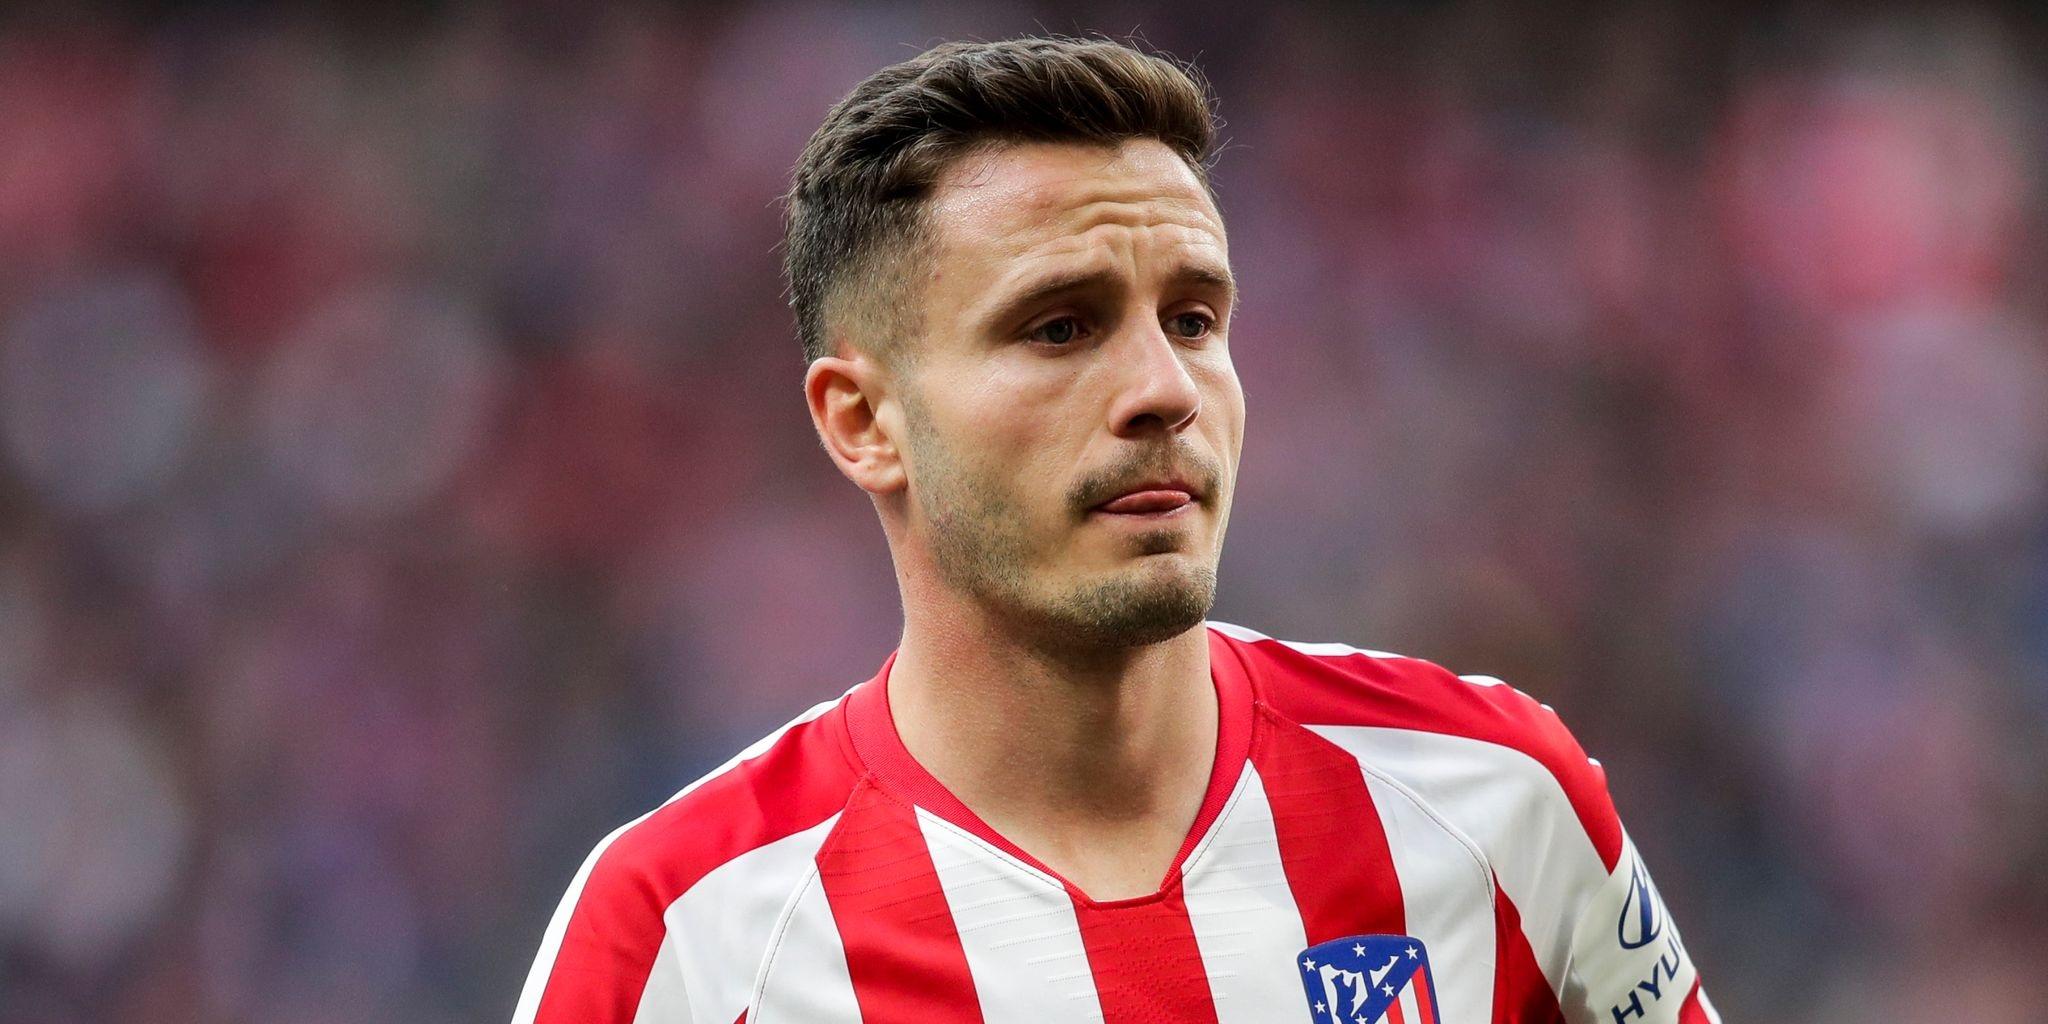 Liverpool could resolve Wijnaldum replacement saga soon as La Liga giants open to €50m star's swift exit – report